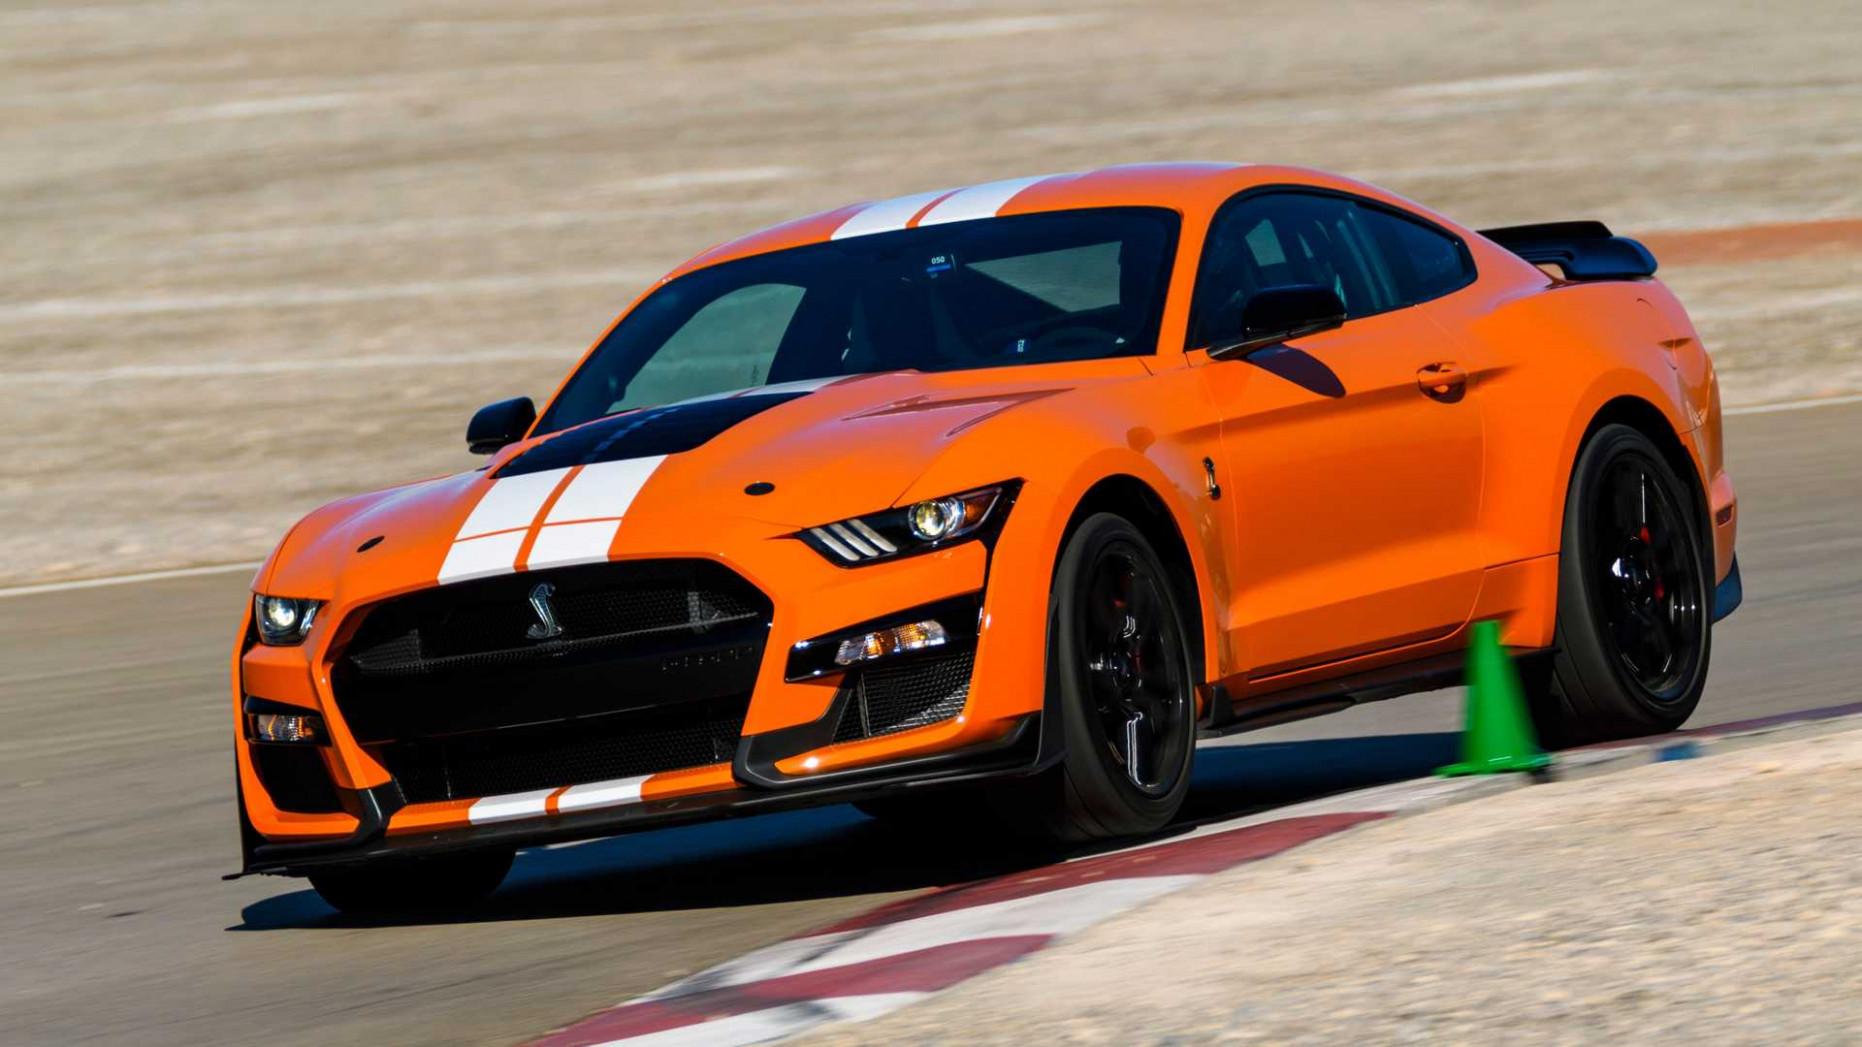 Wallpaper 2022 Mustang Gt500